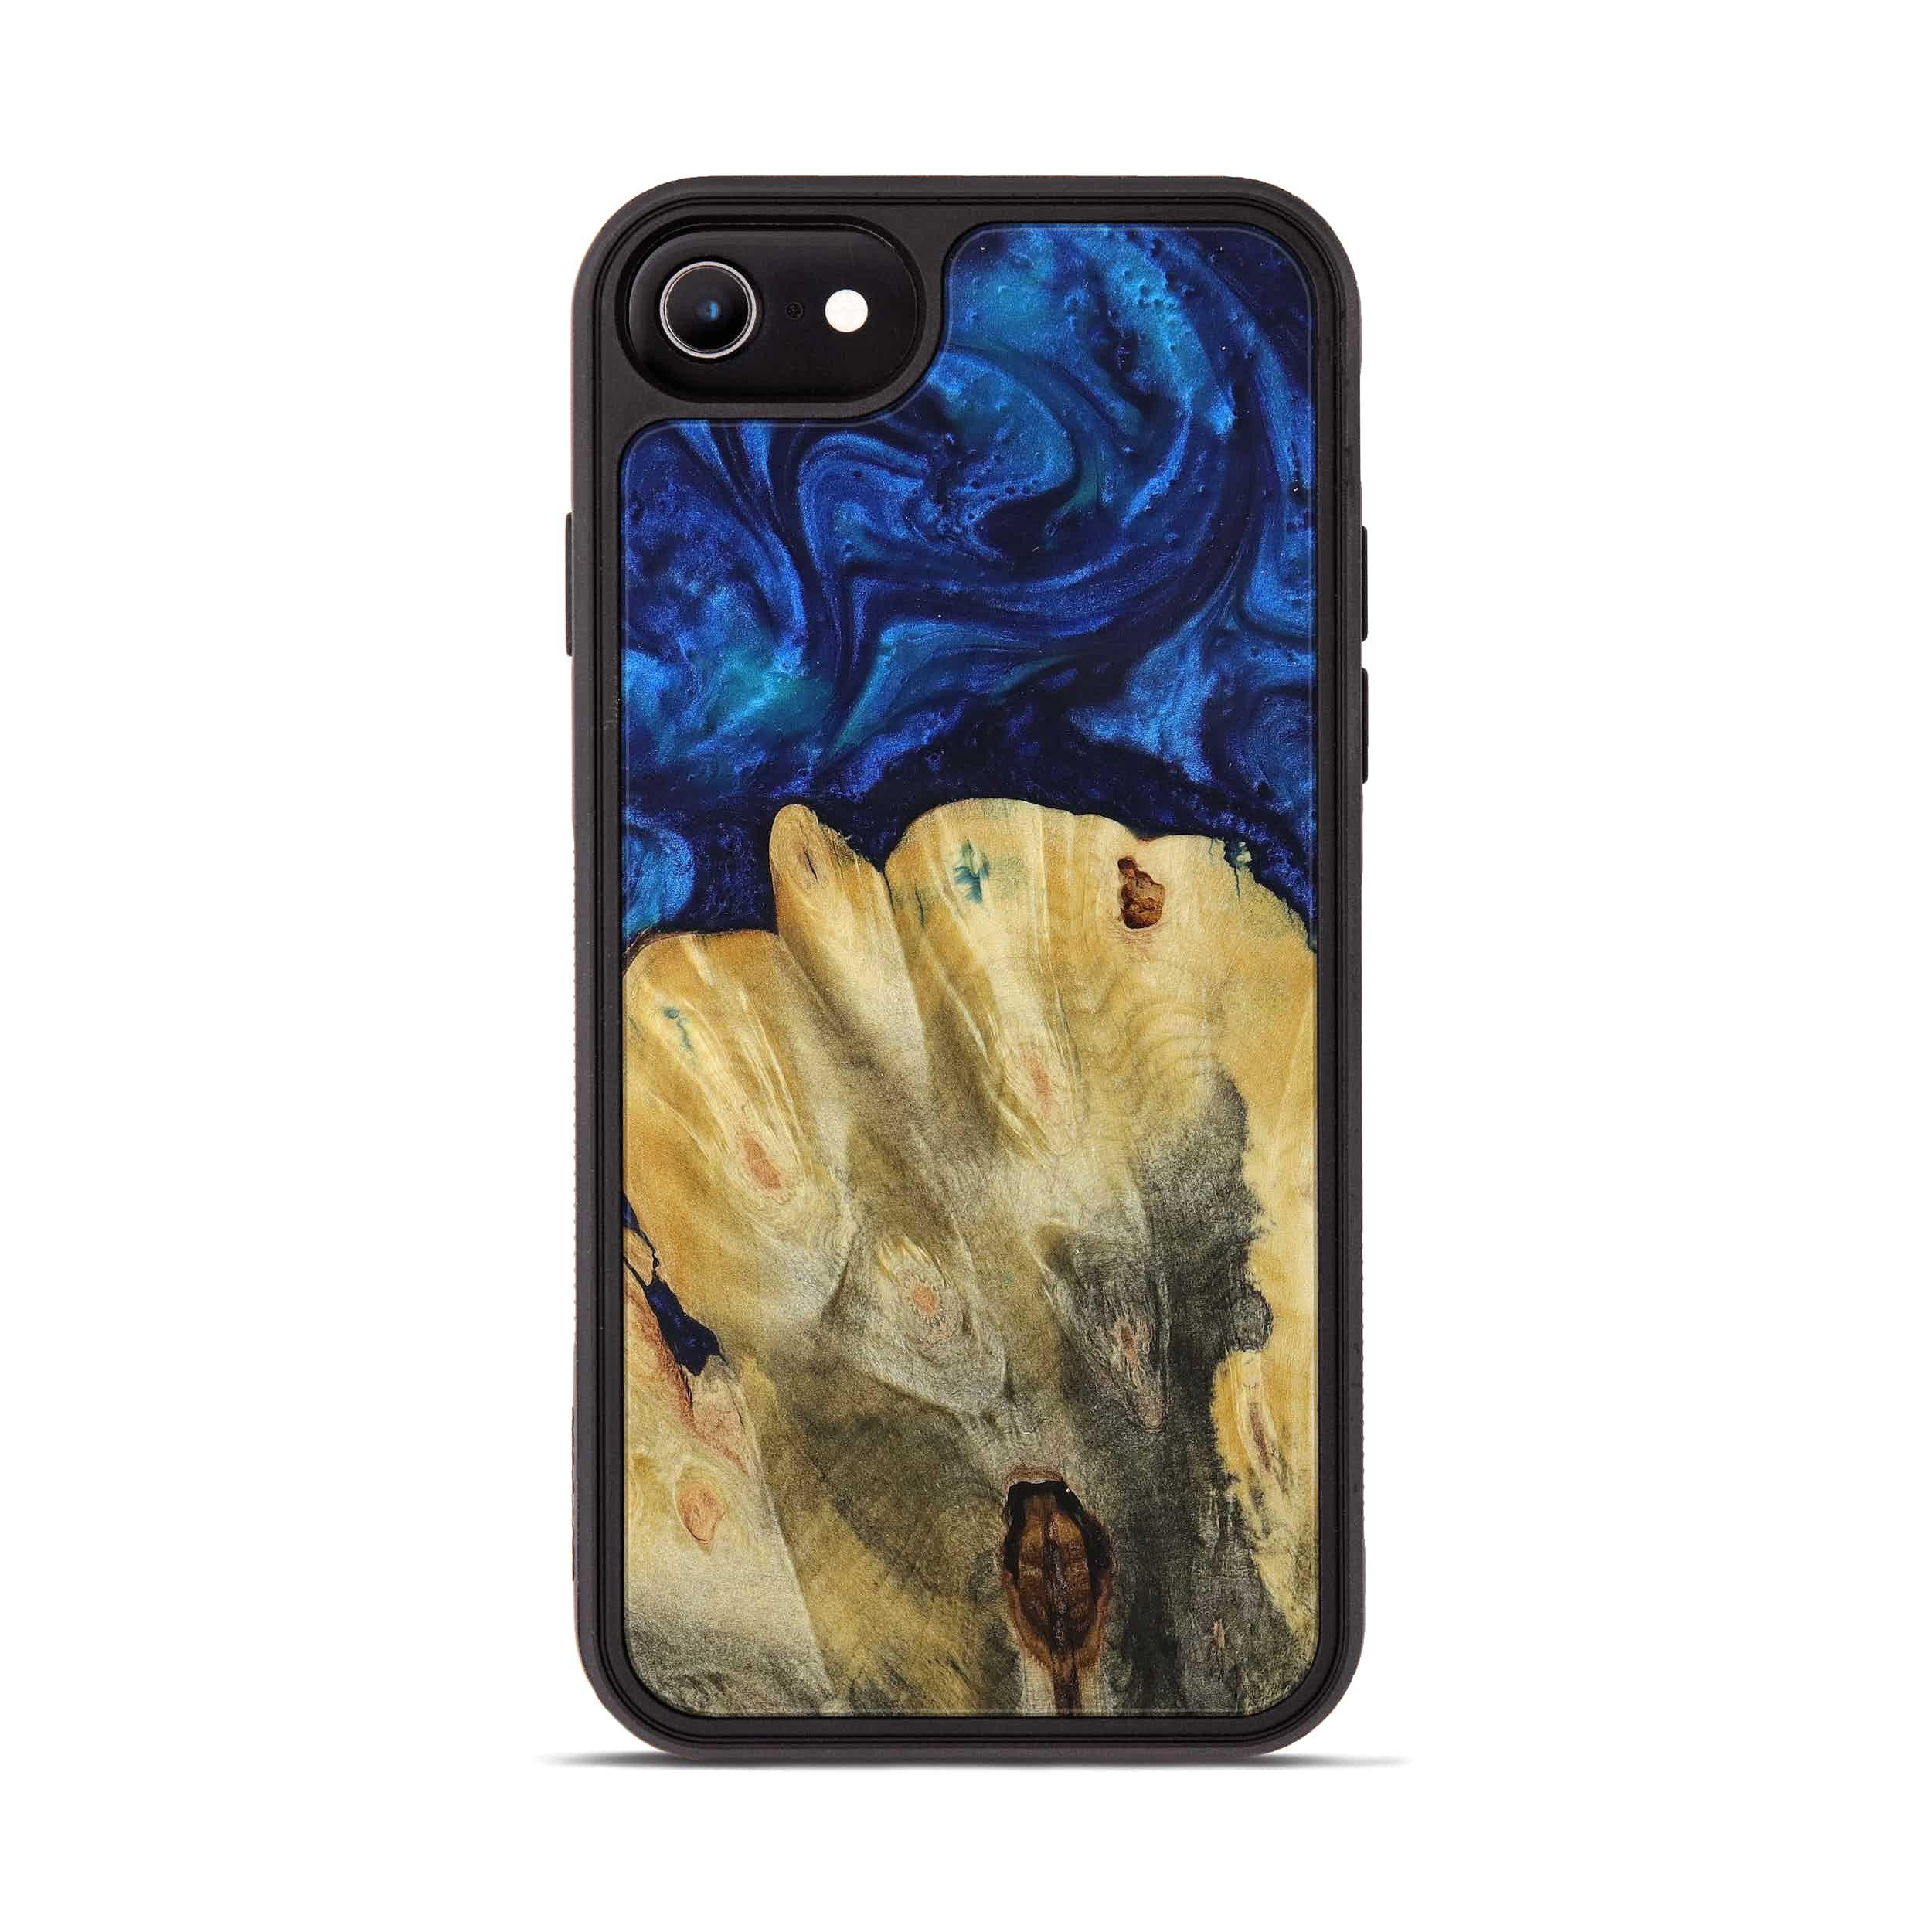 iPhone 8 Wood+Resin Phone Case - Milena (Dark Blue, 394575)